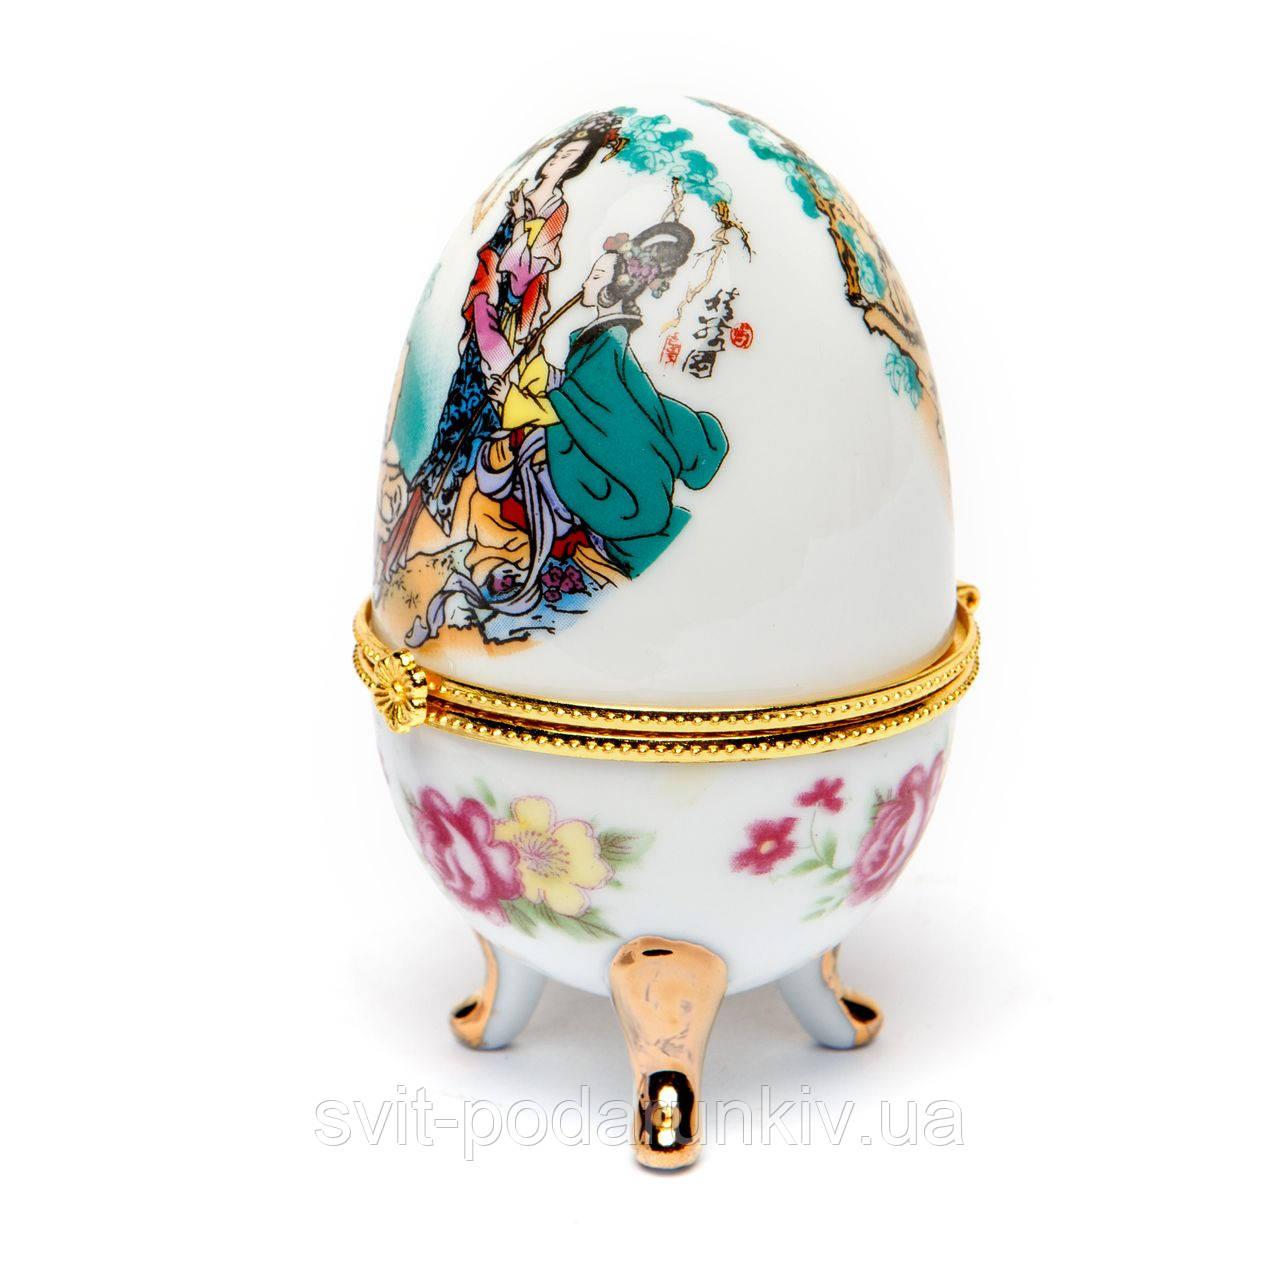 Шкатулка из фарфора №3-2 яйцо